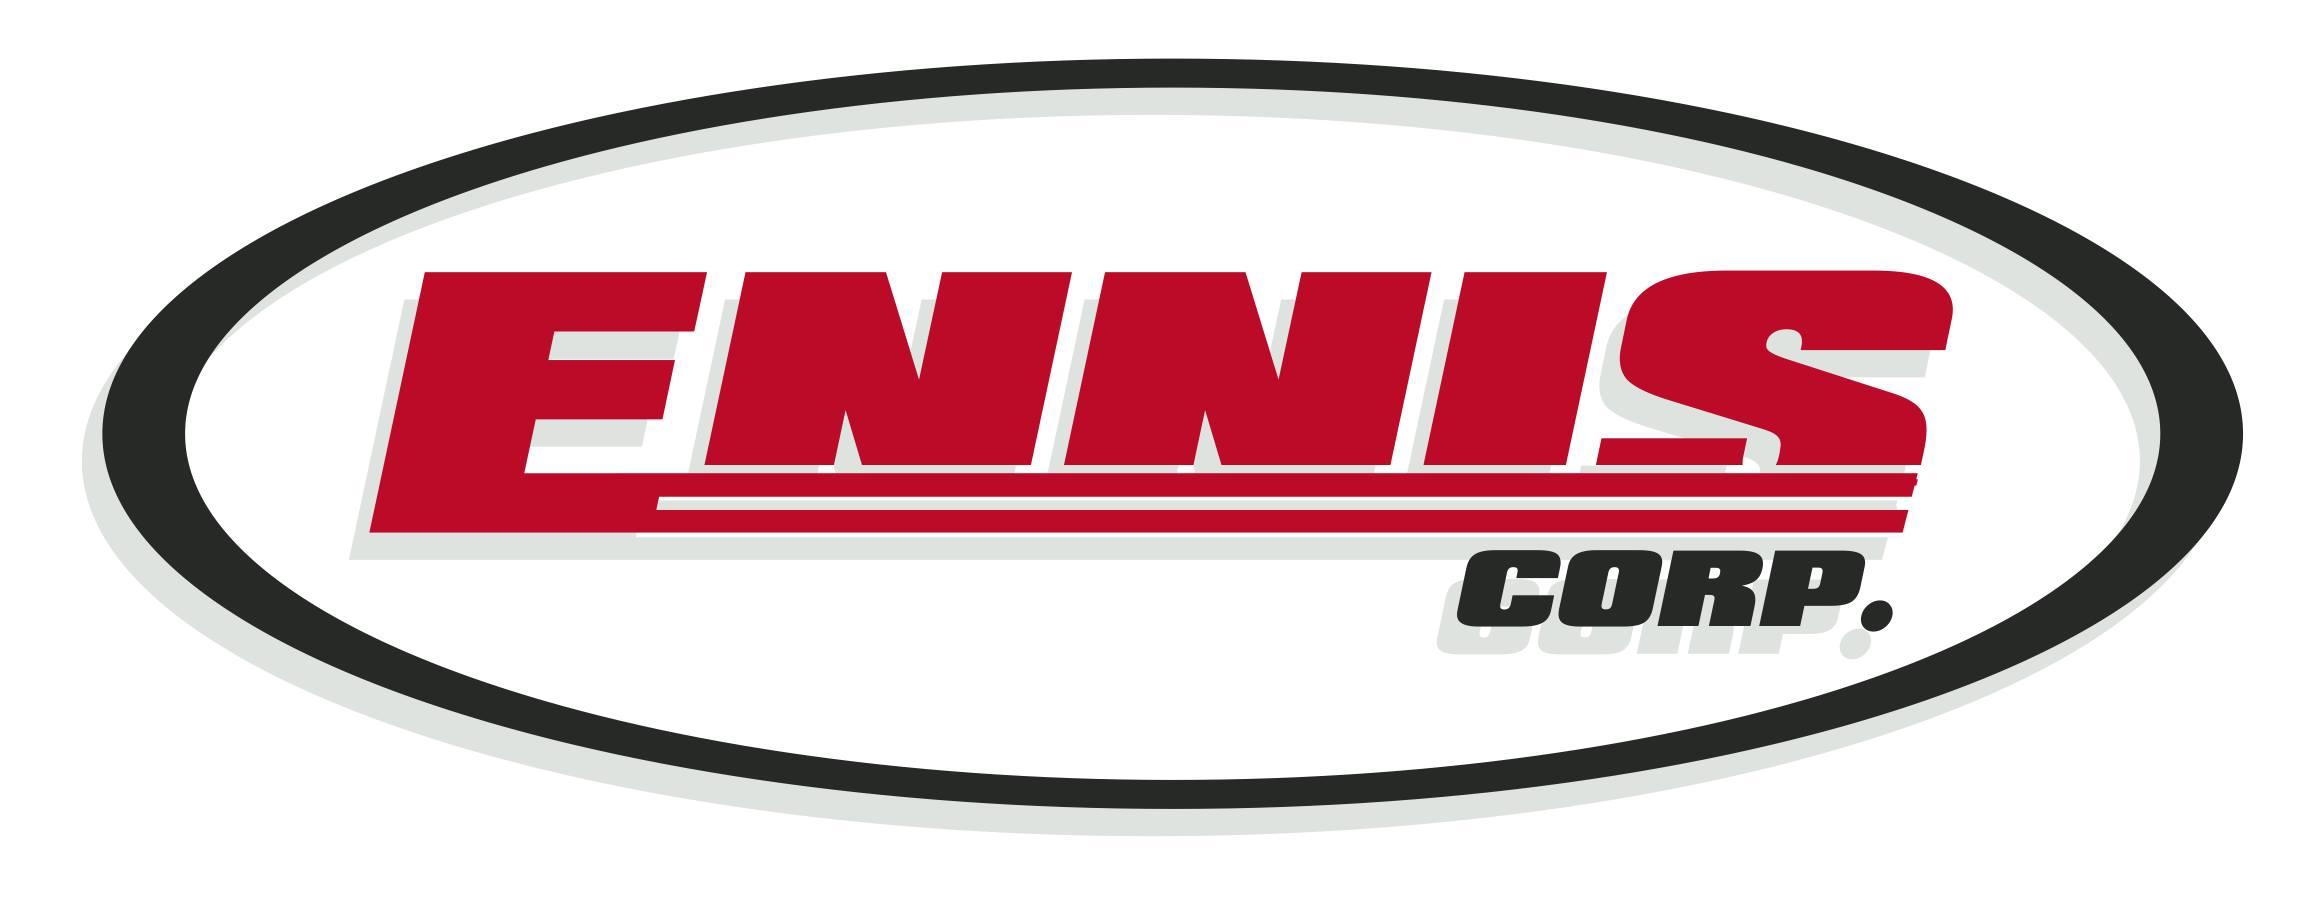 Ennis Corp